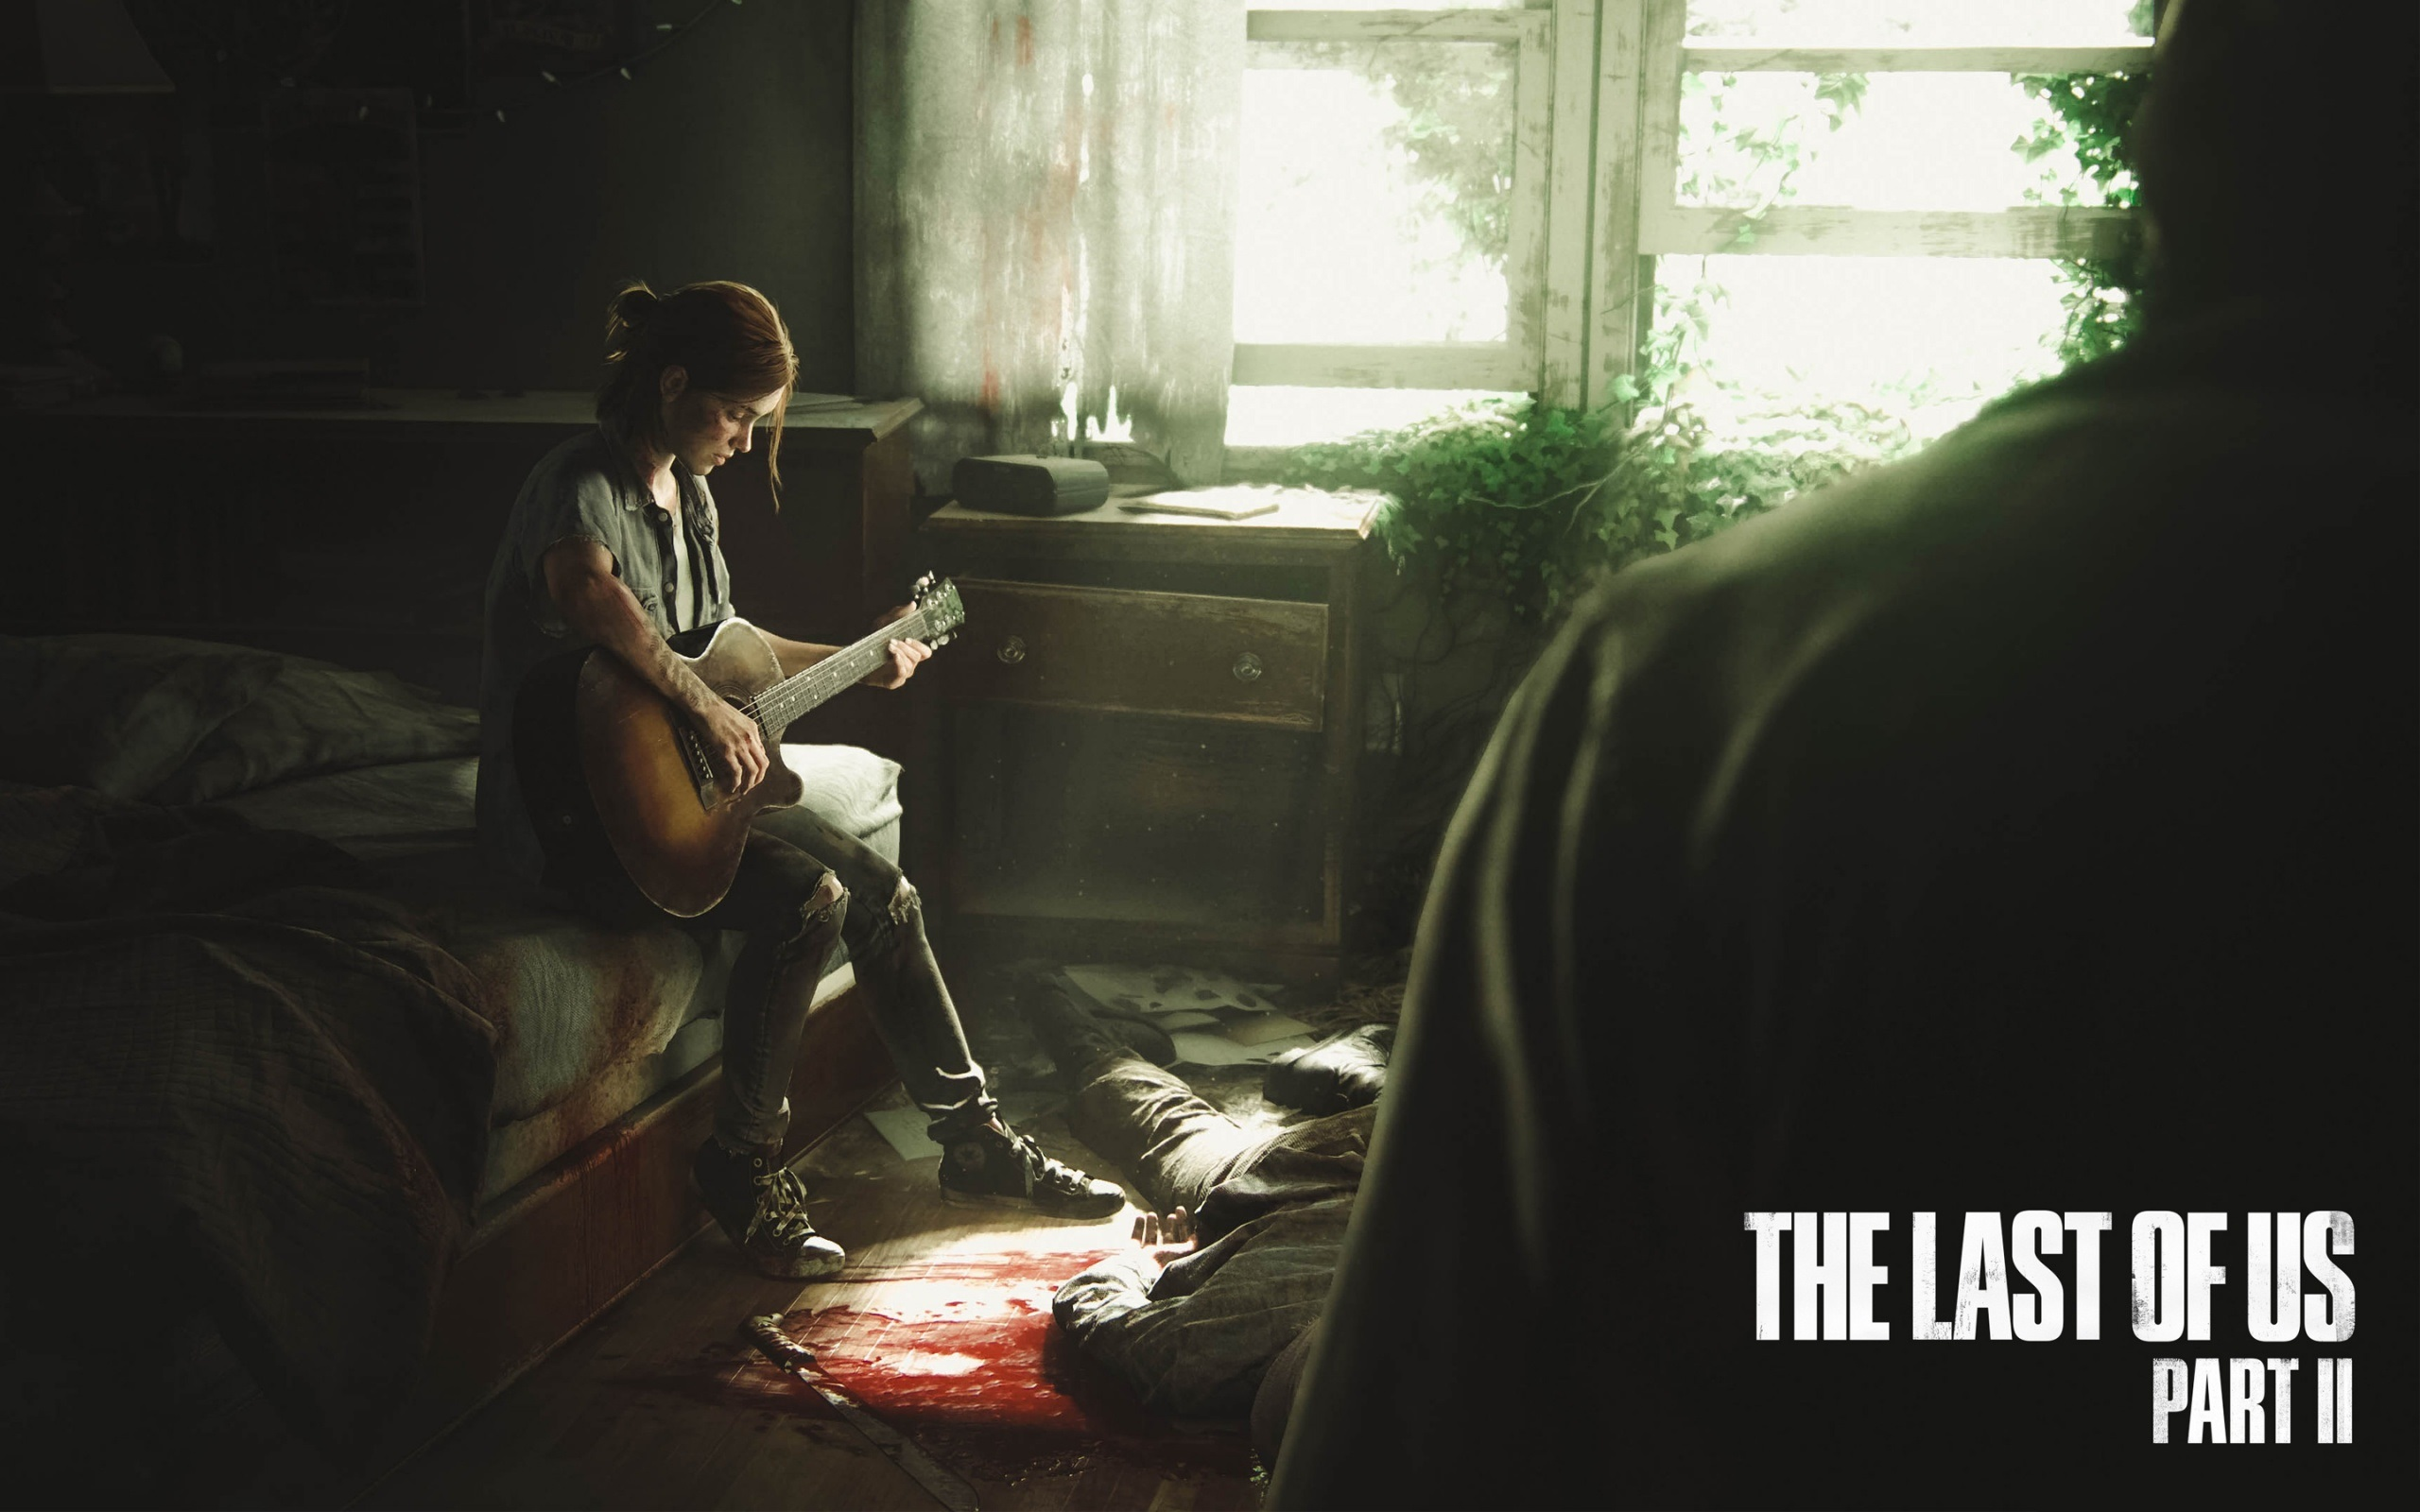 The Last of Us: Part II стала самым быстро продаваемым эксклюзивом на PlayStation 4